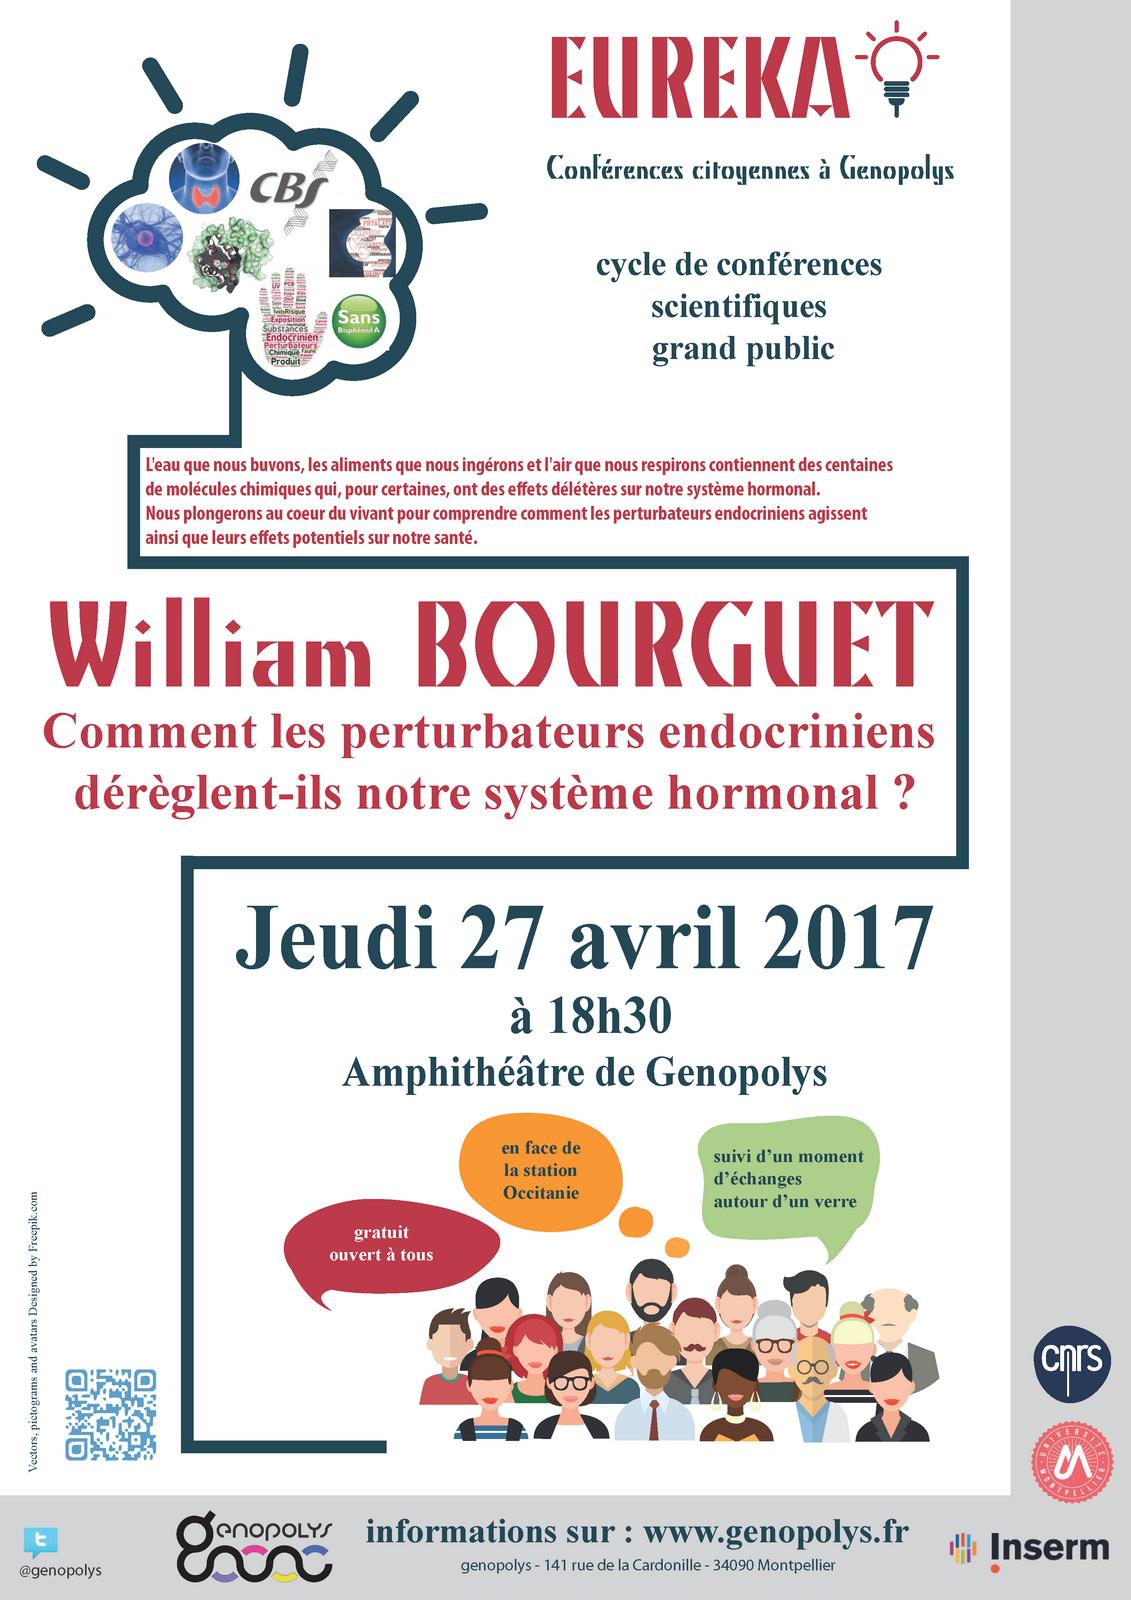 eureka BOURGUET avril 2017